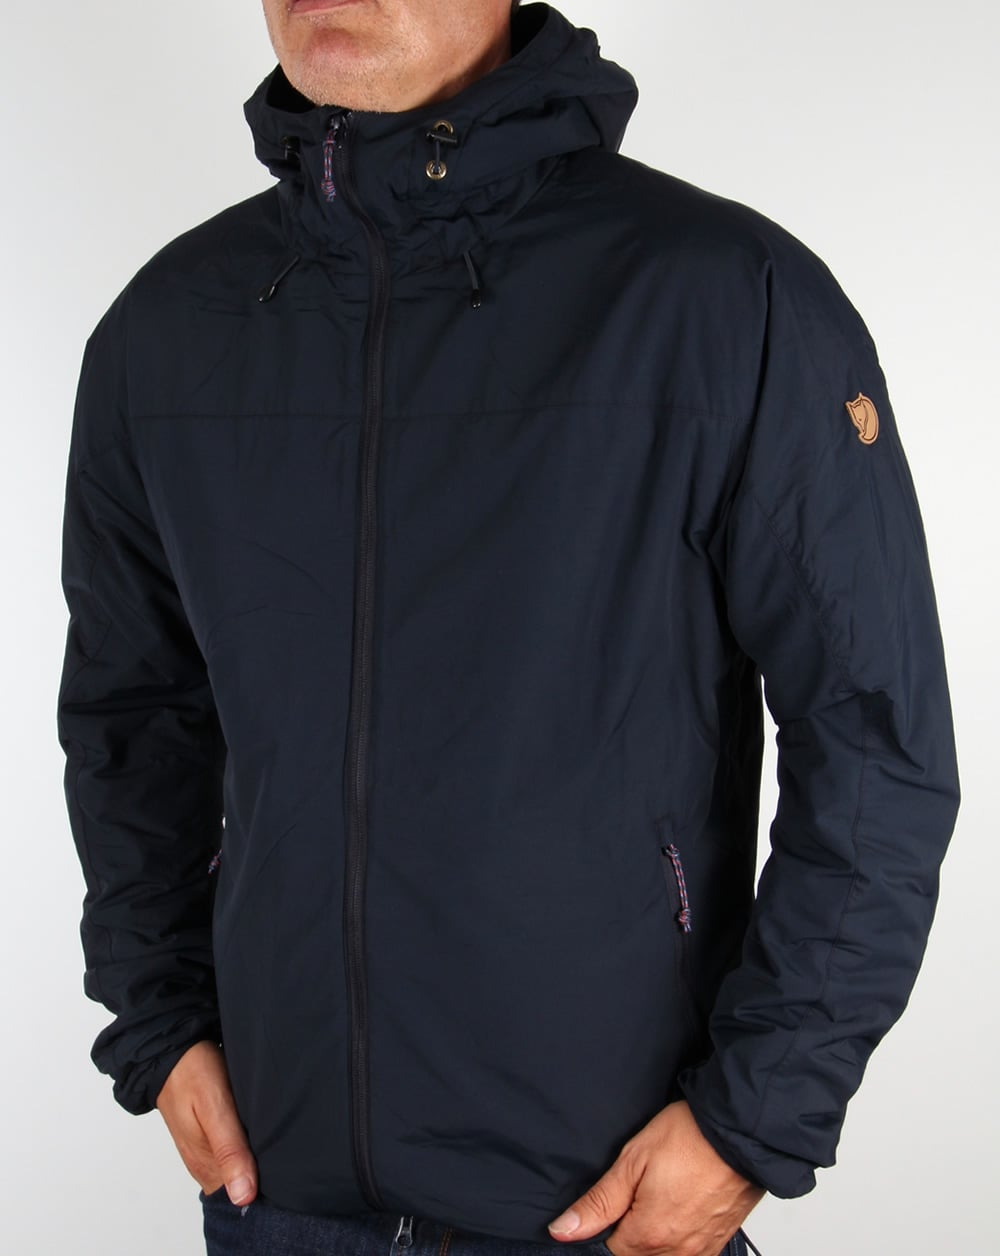 FJ/ÄLLR/ÄVEN Mens High Coast Jacket